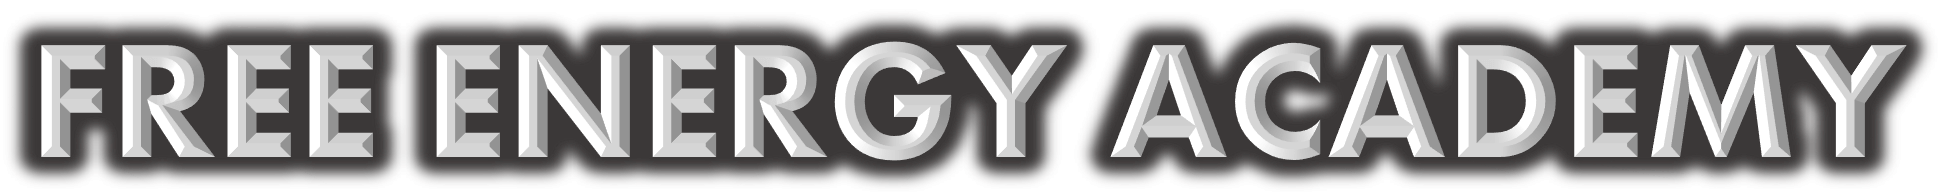 Free Energy Academy v1